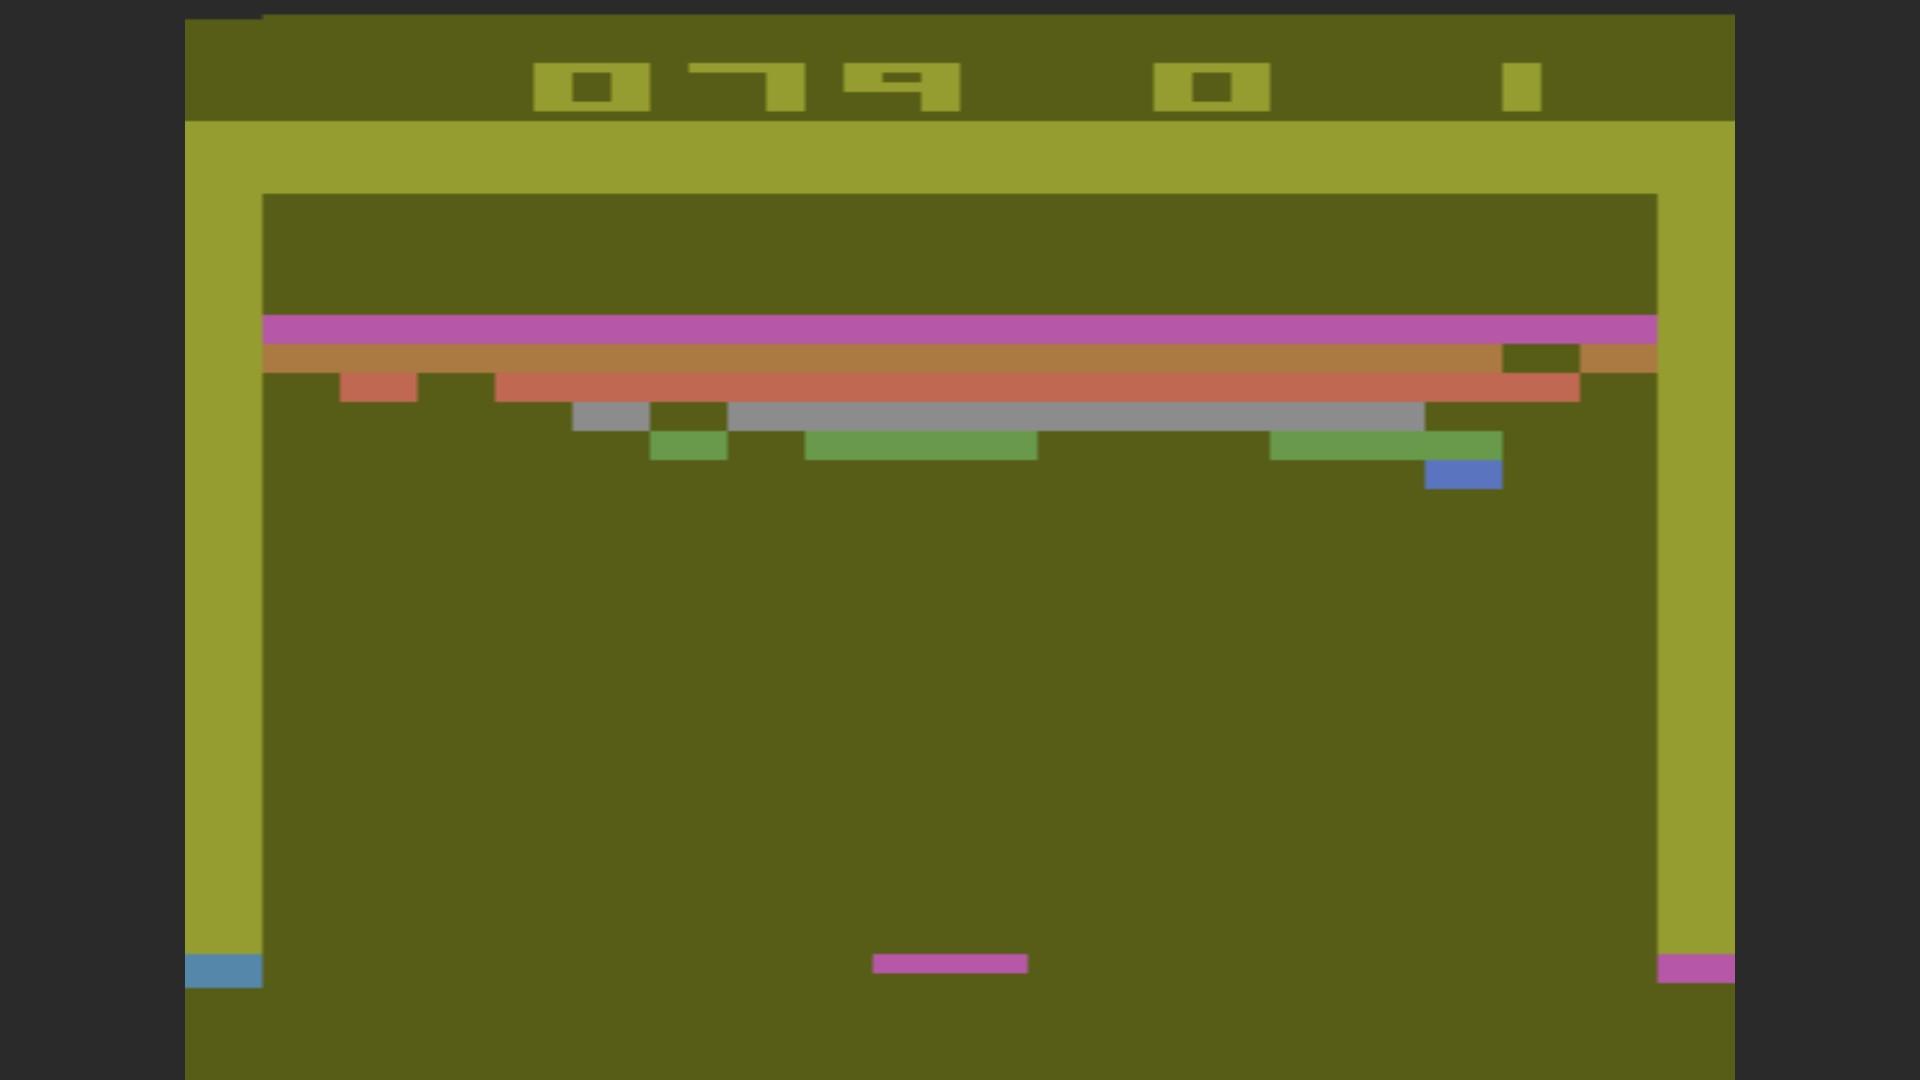 AkinNahtanoj: Breakout: Game 2 (Atari 2600 Emulated Novice/B Mode) 79 points on 2020-10-13 15:42:22